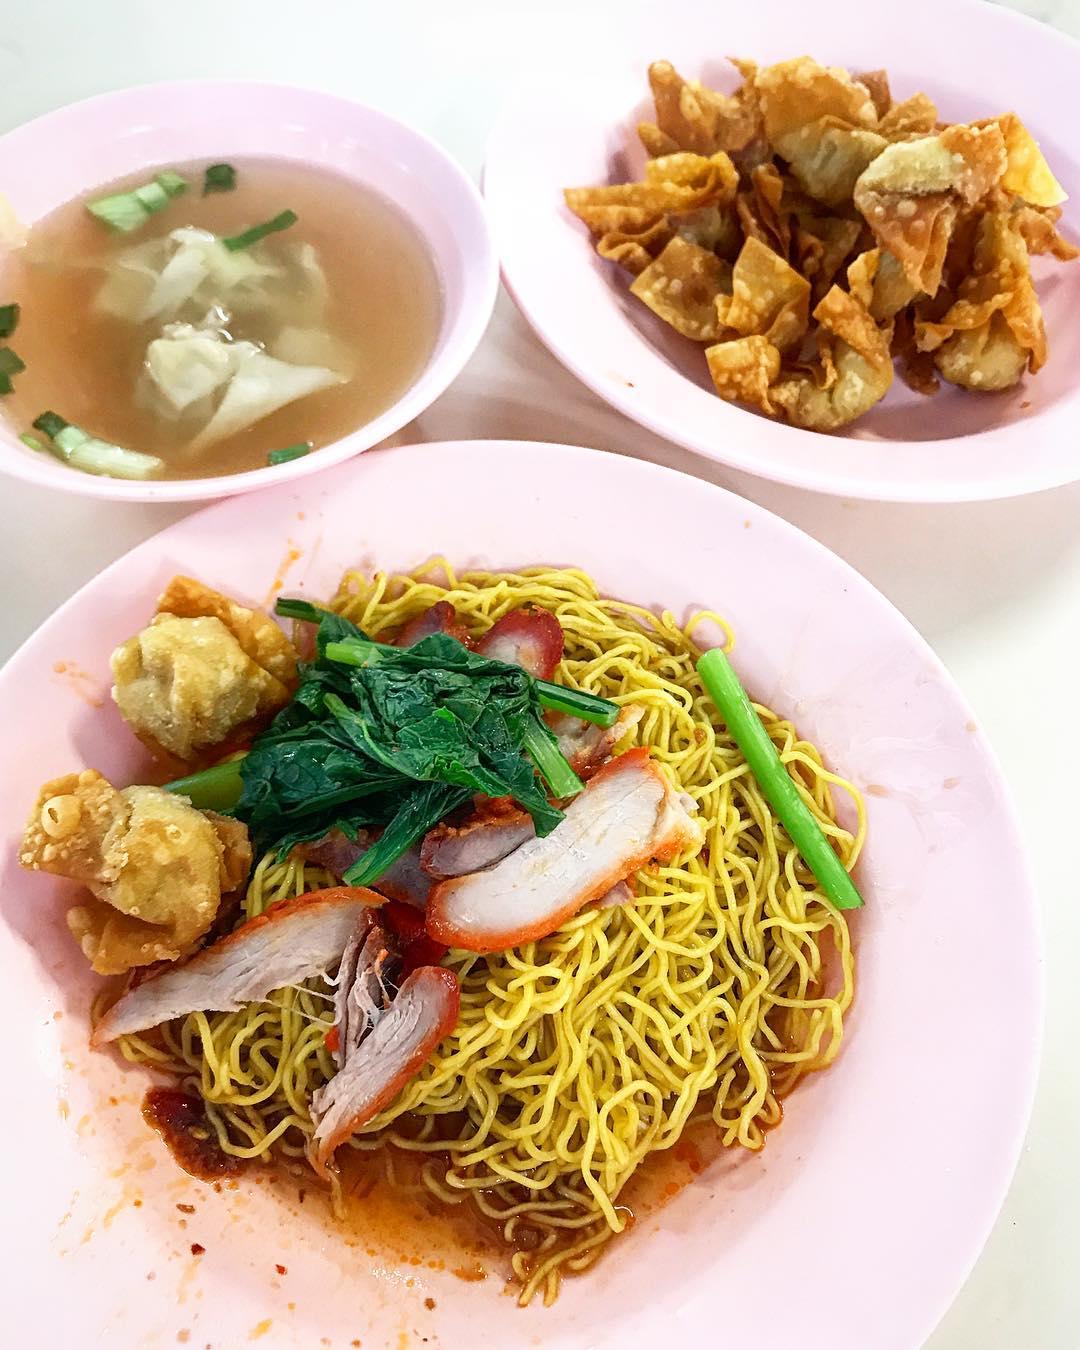 tian xiang wanton mee tanglin halt food centre